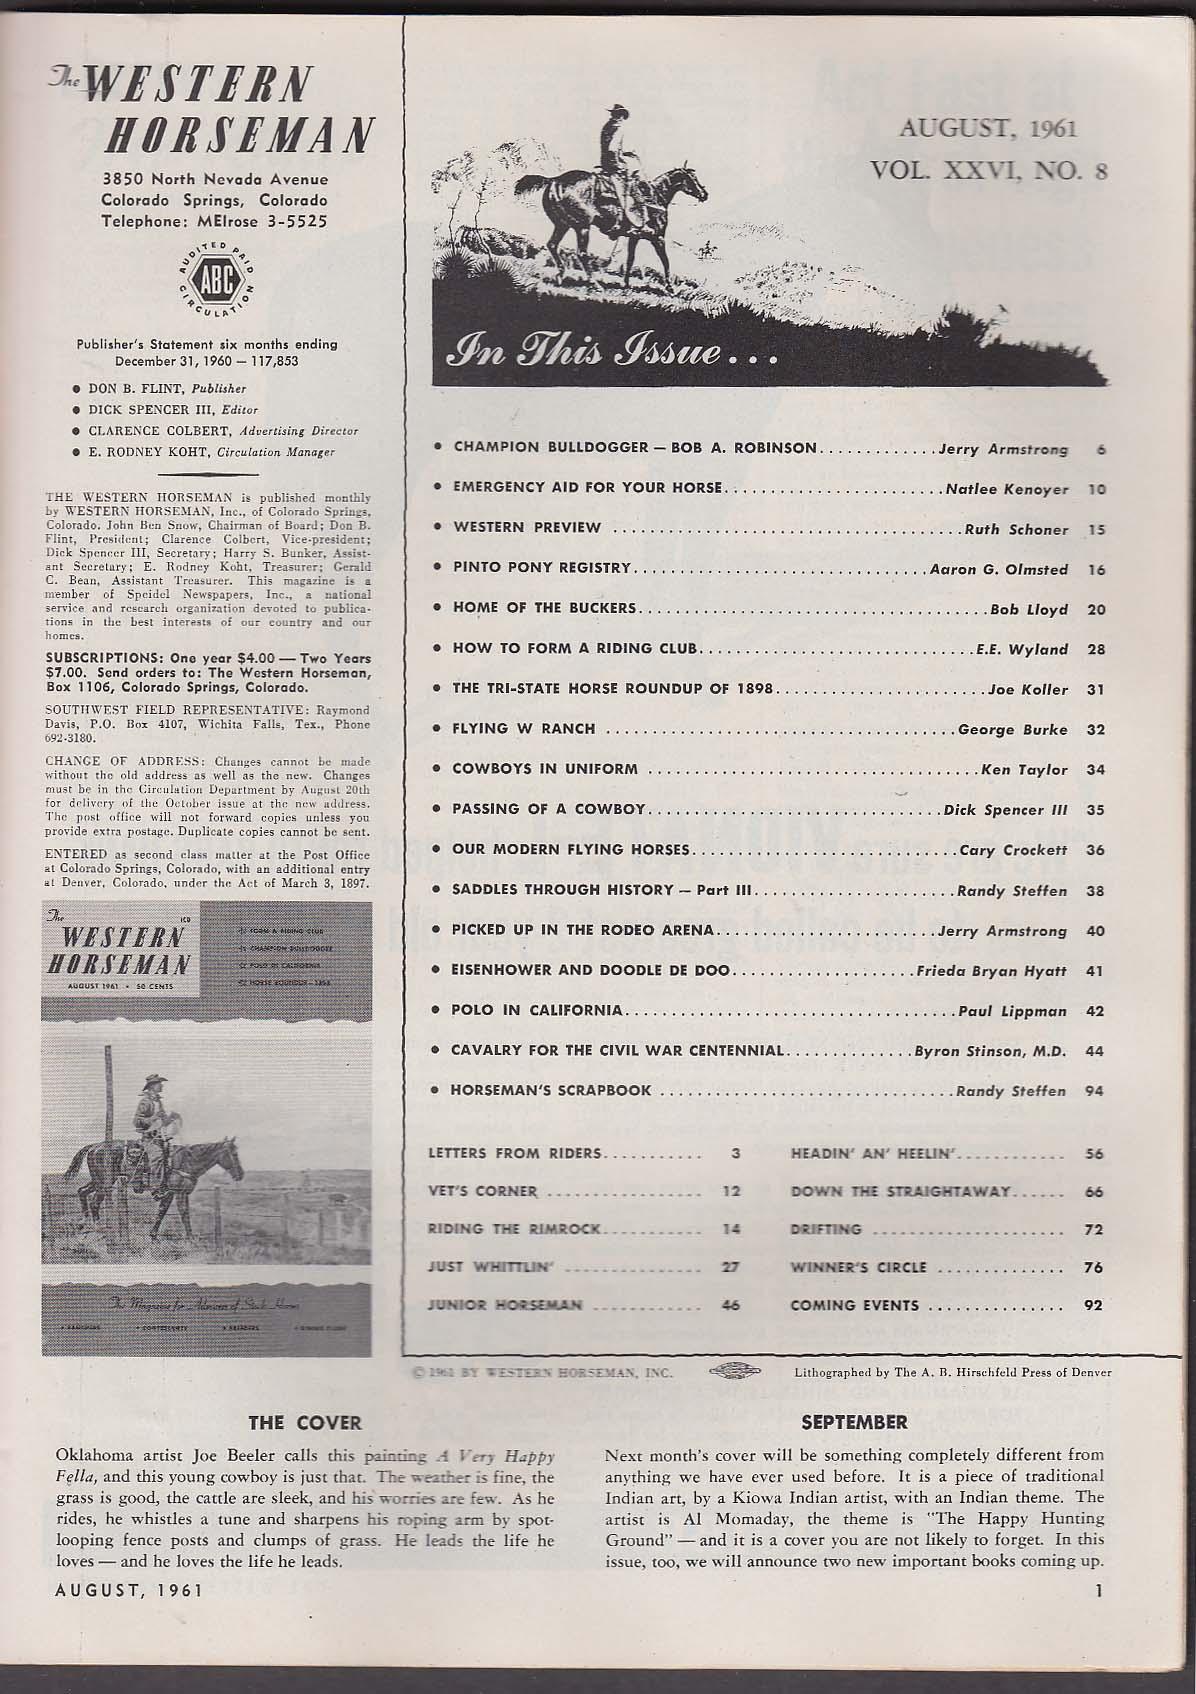 Image for WESTERN HORSEMAN Riding Clubs Champion Bulldogger California Polo ++ 8 1961